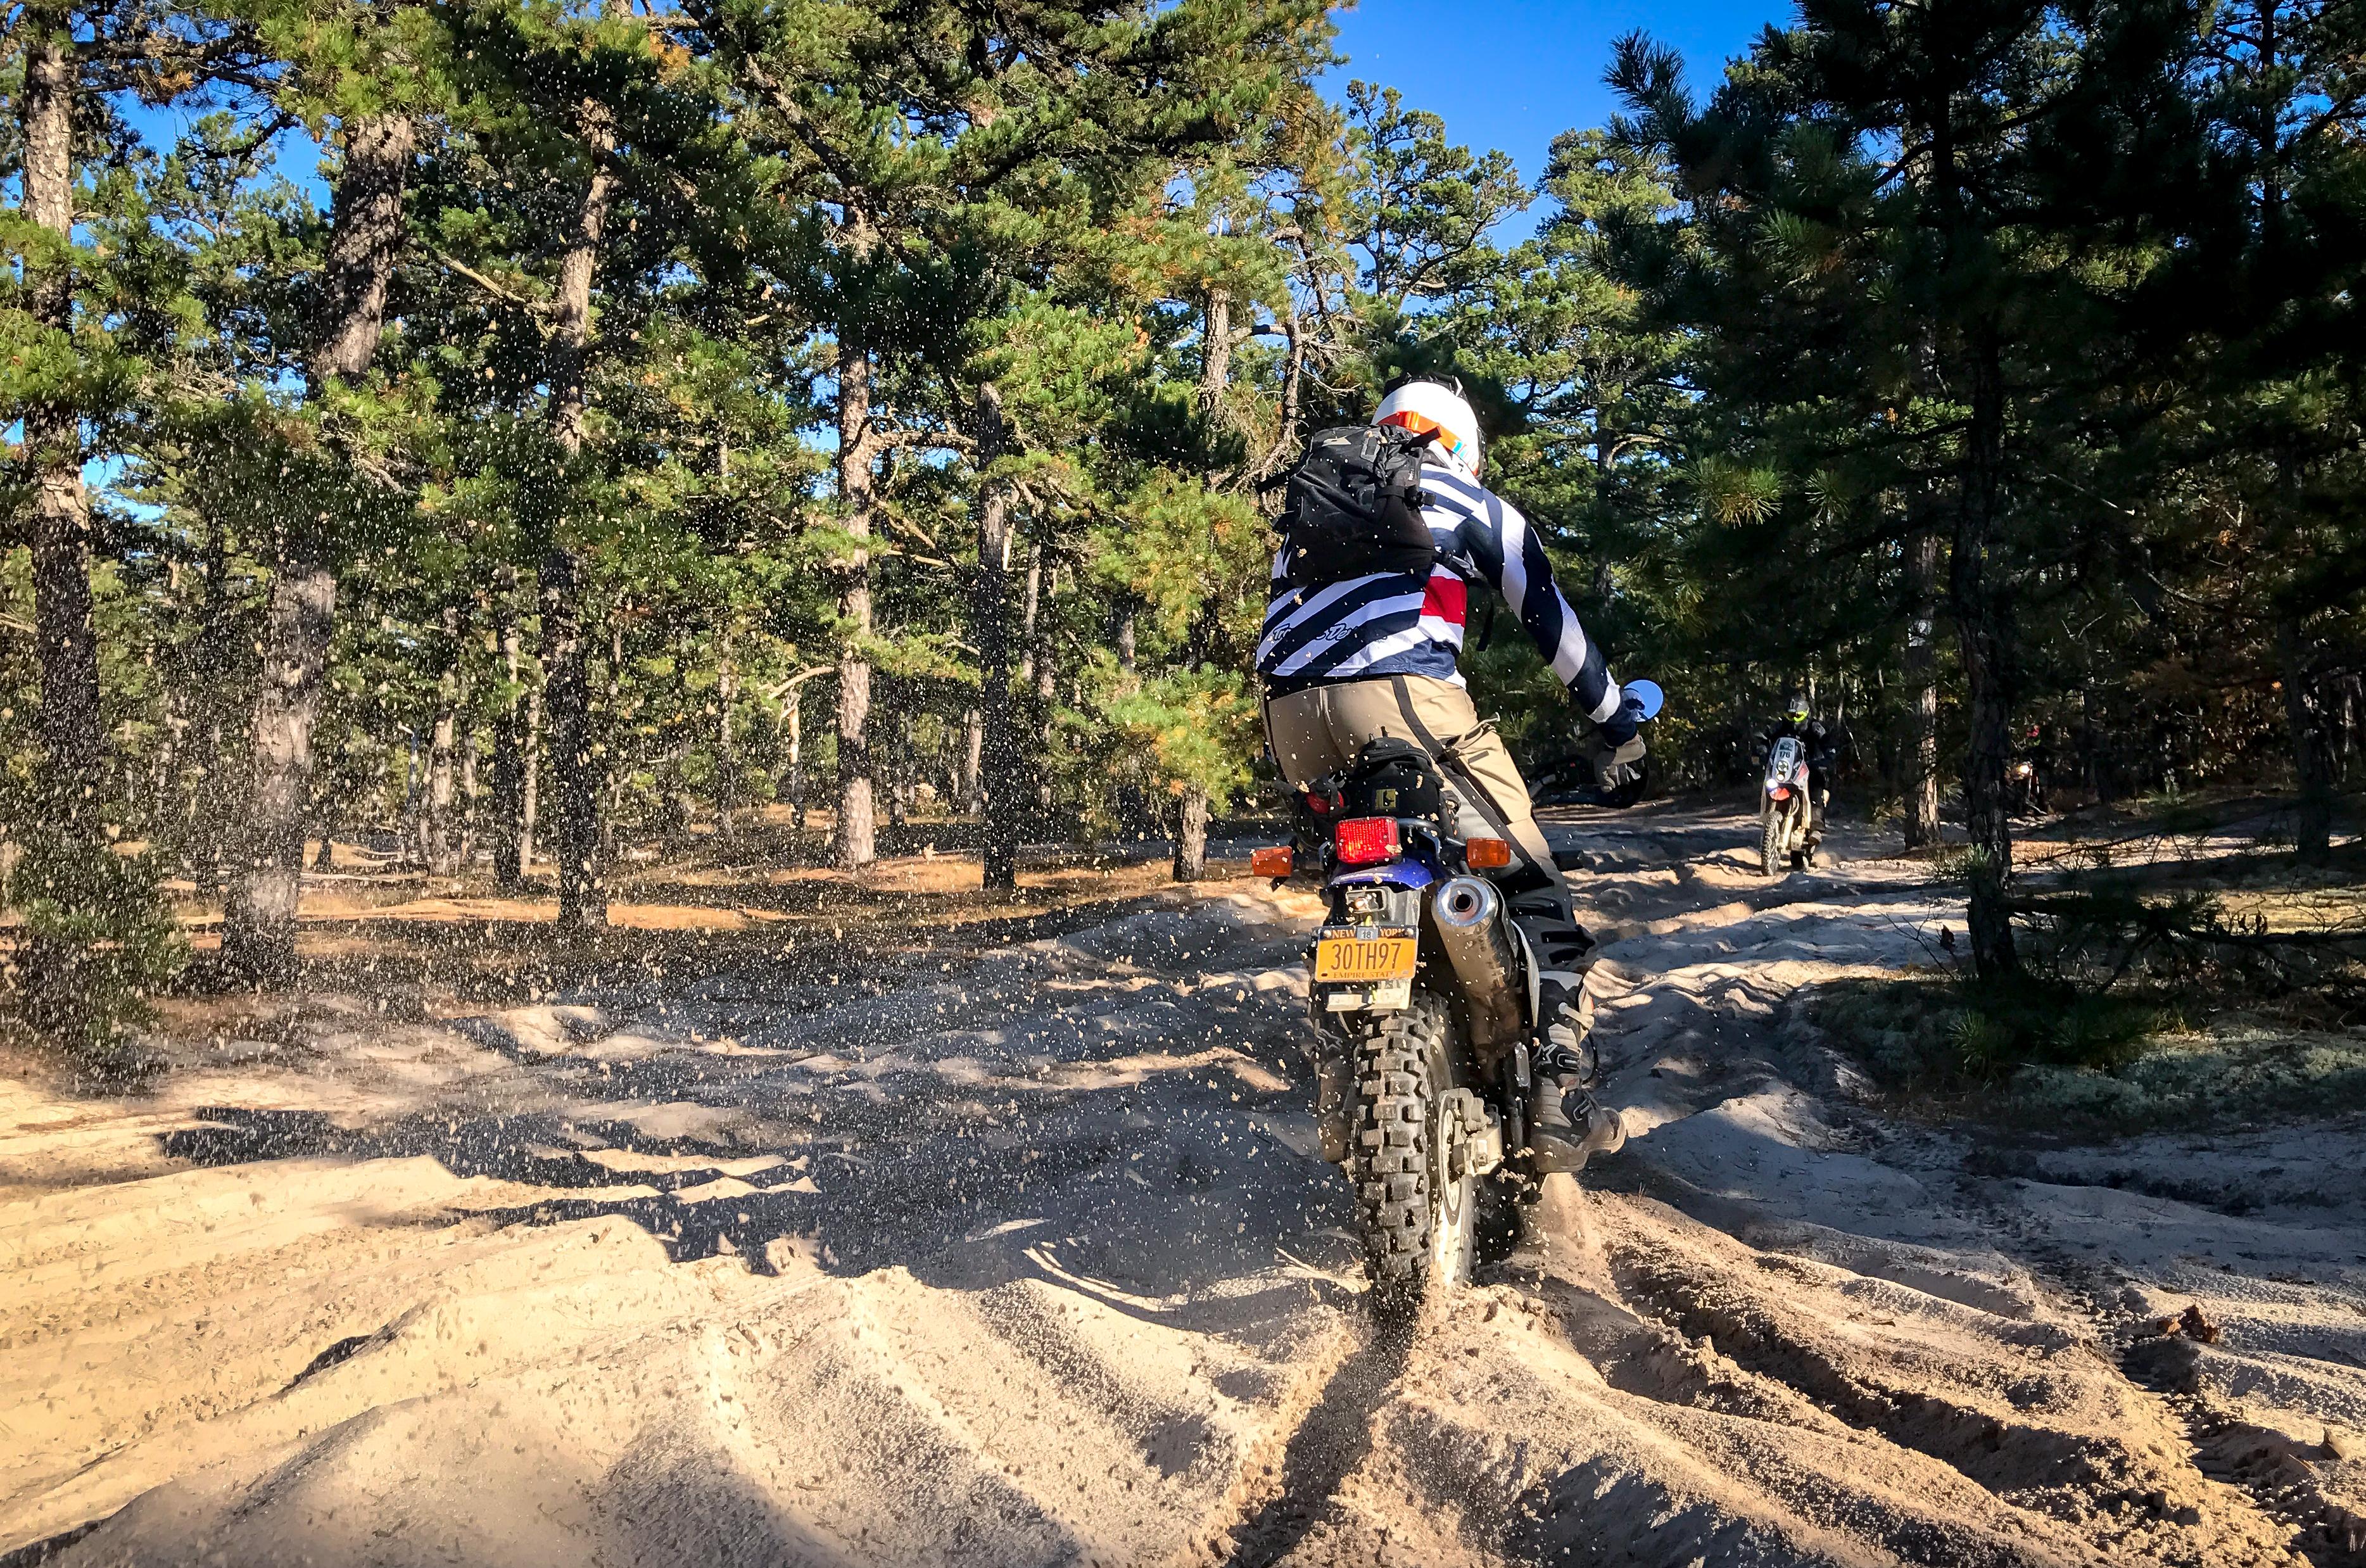 The terrifically fun tale of the $1,000 adventure bike